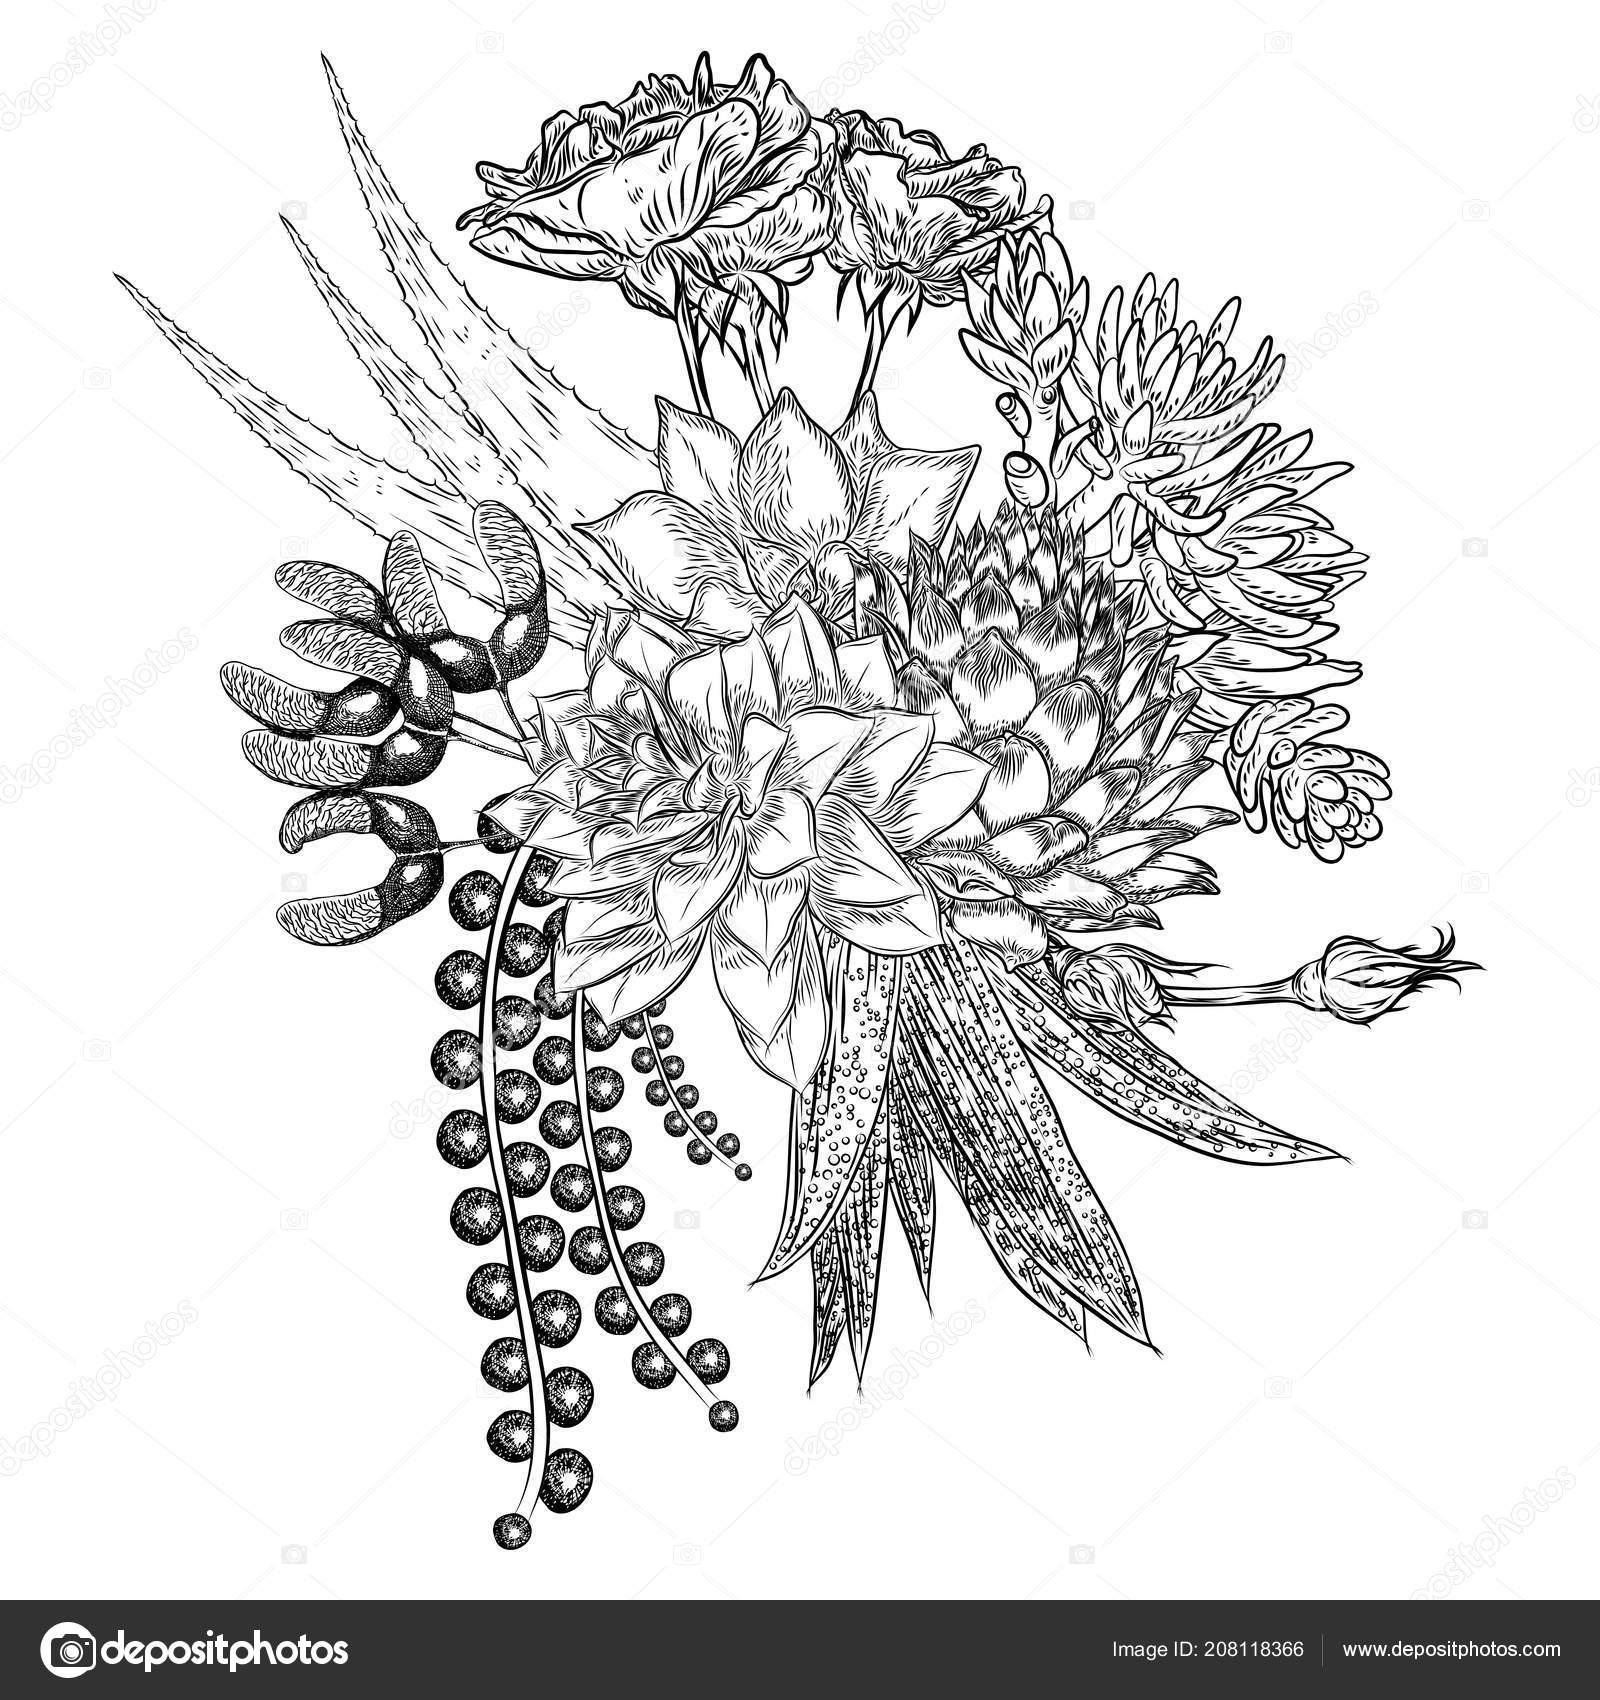 Succulent Tattoo Black Composition Succulents Cactus Green Plants Botanical Drawing Black White Handdrawn Stock Vector C Goldenshrimp 208118366